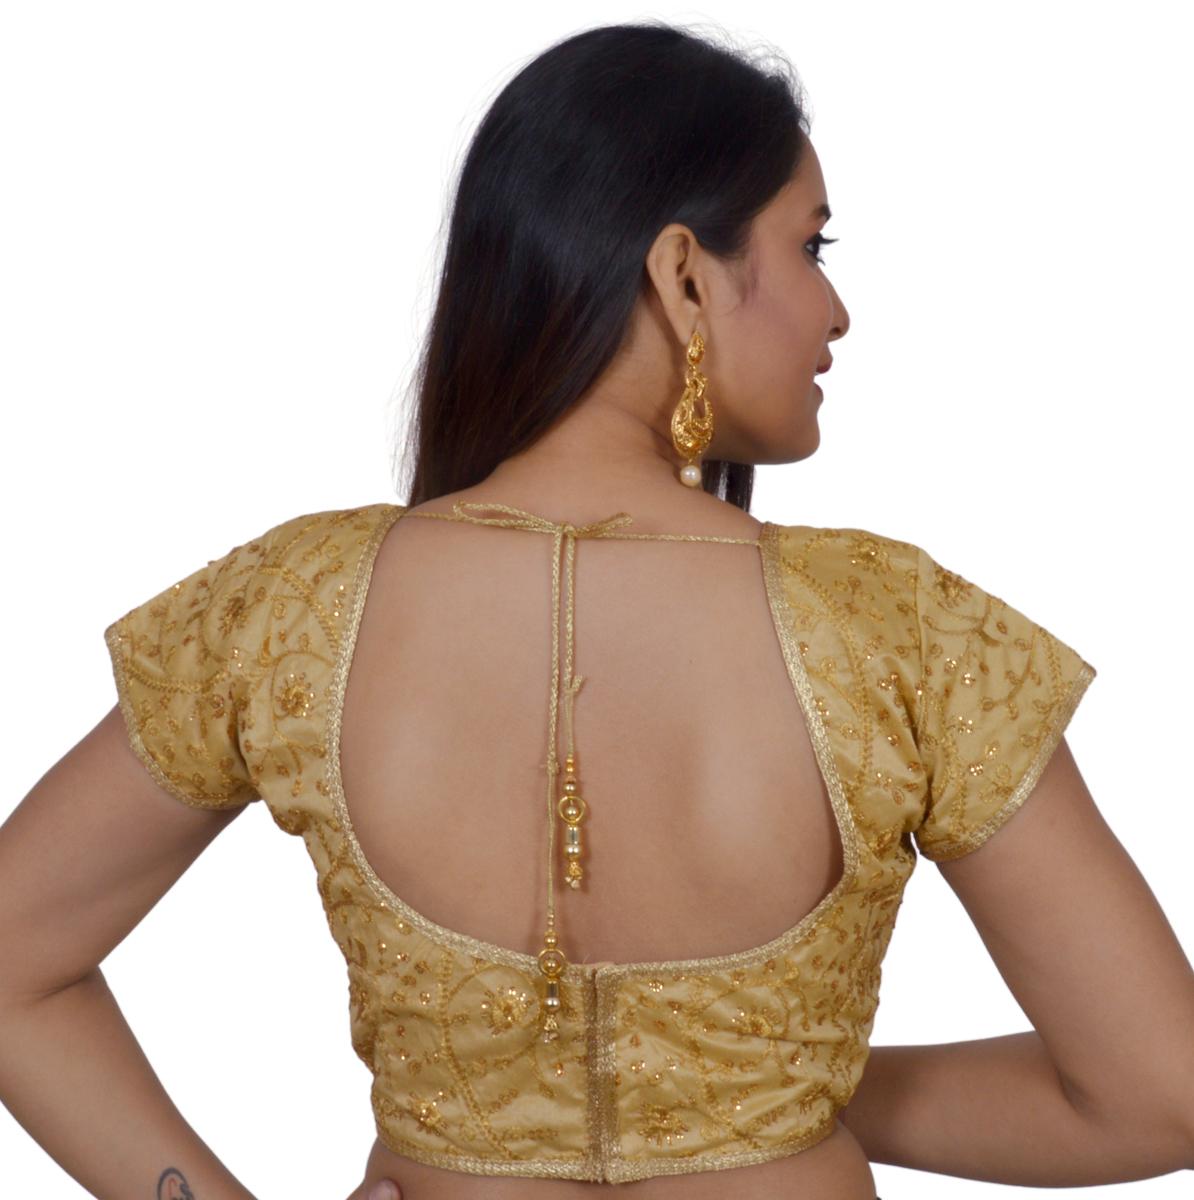 1a11fe798d799 Rinkoo Women S Art Silk Silver Princess Cut Padded Readymade Saree Blouse  Ping Site For Fashion. Readymade Saree Blouse Brick Red Color Princess Cut  Semi ...